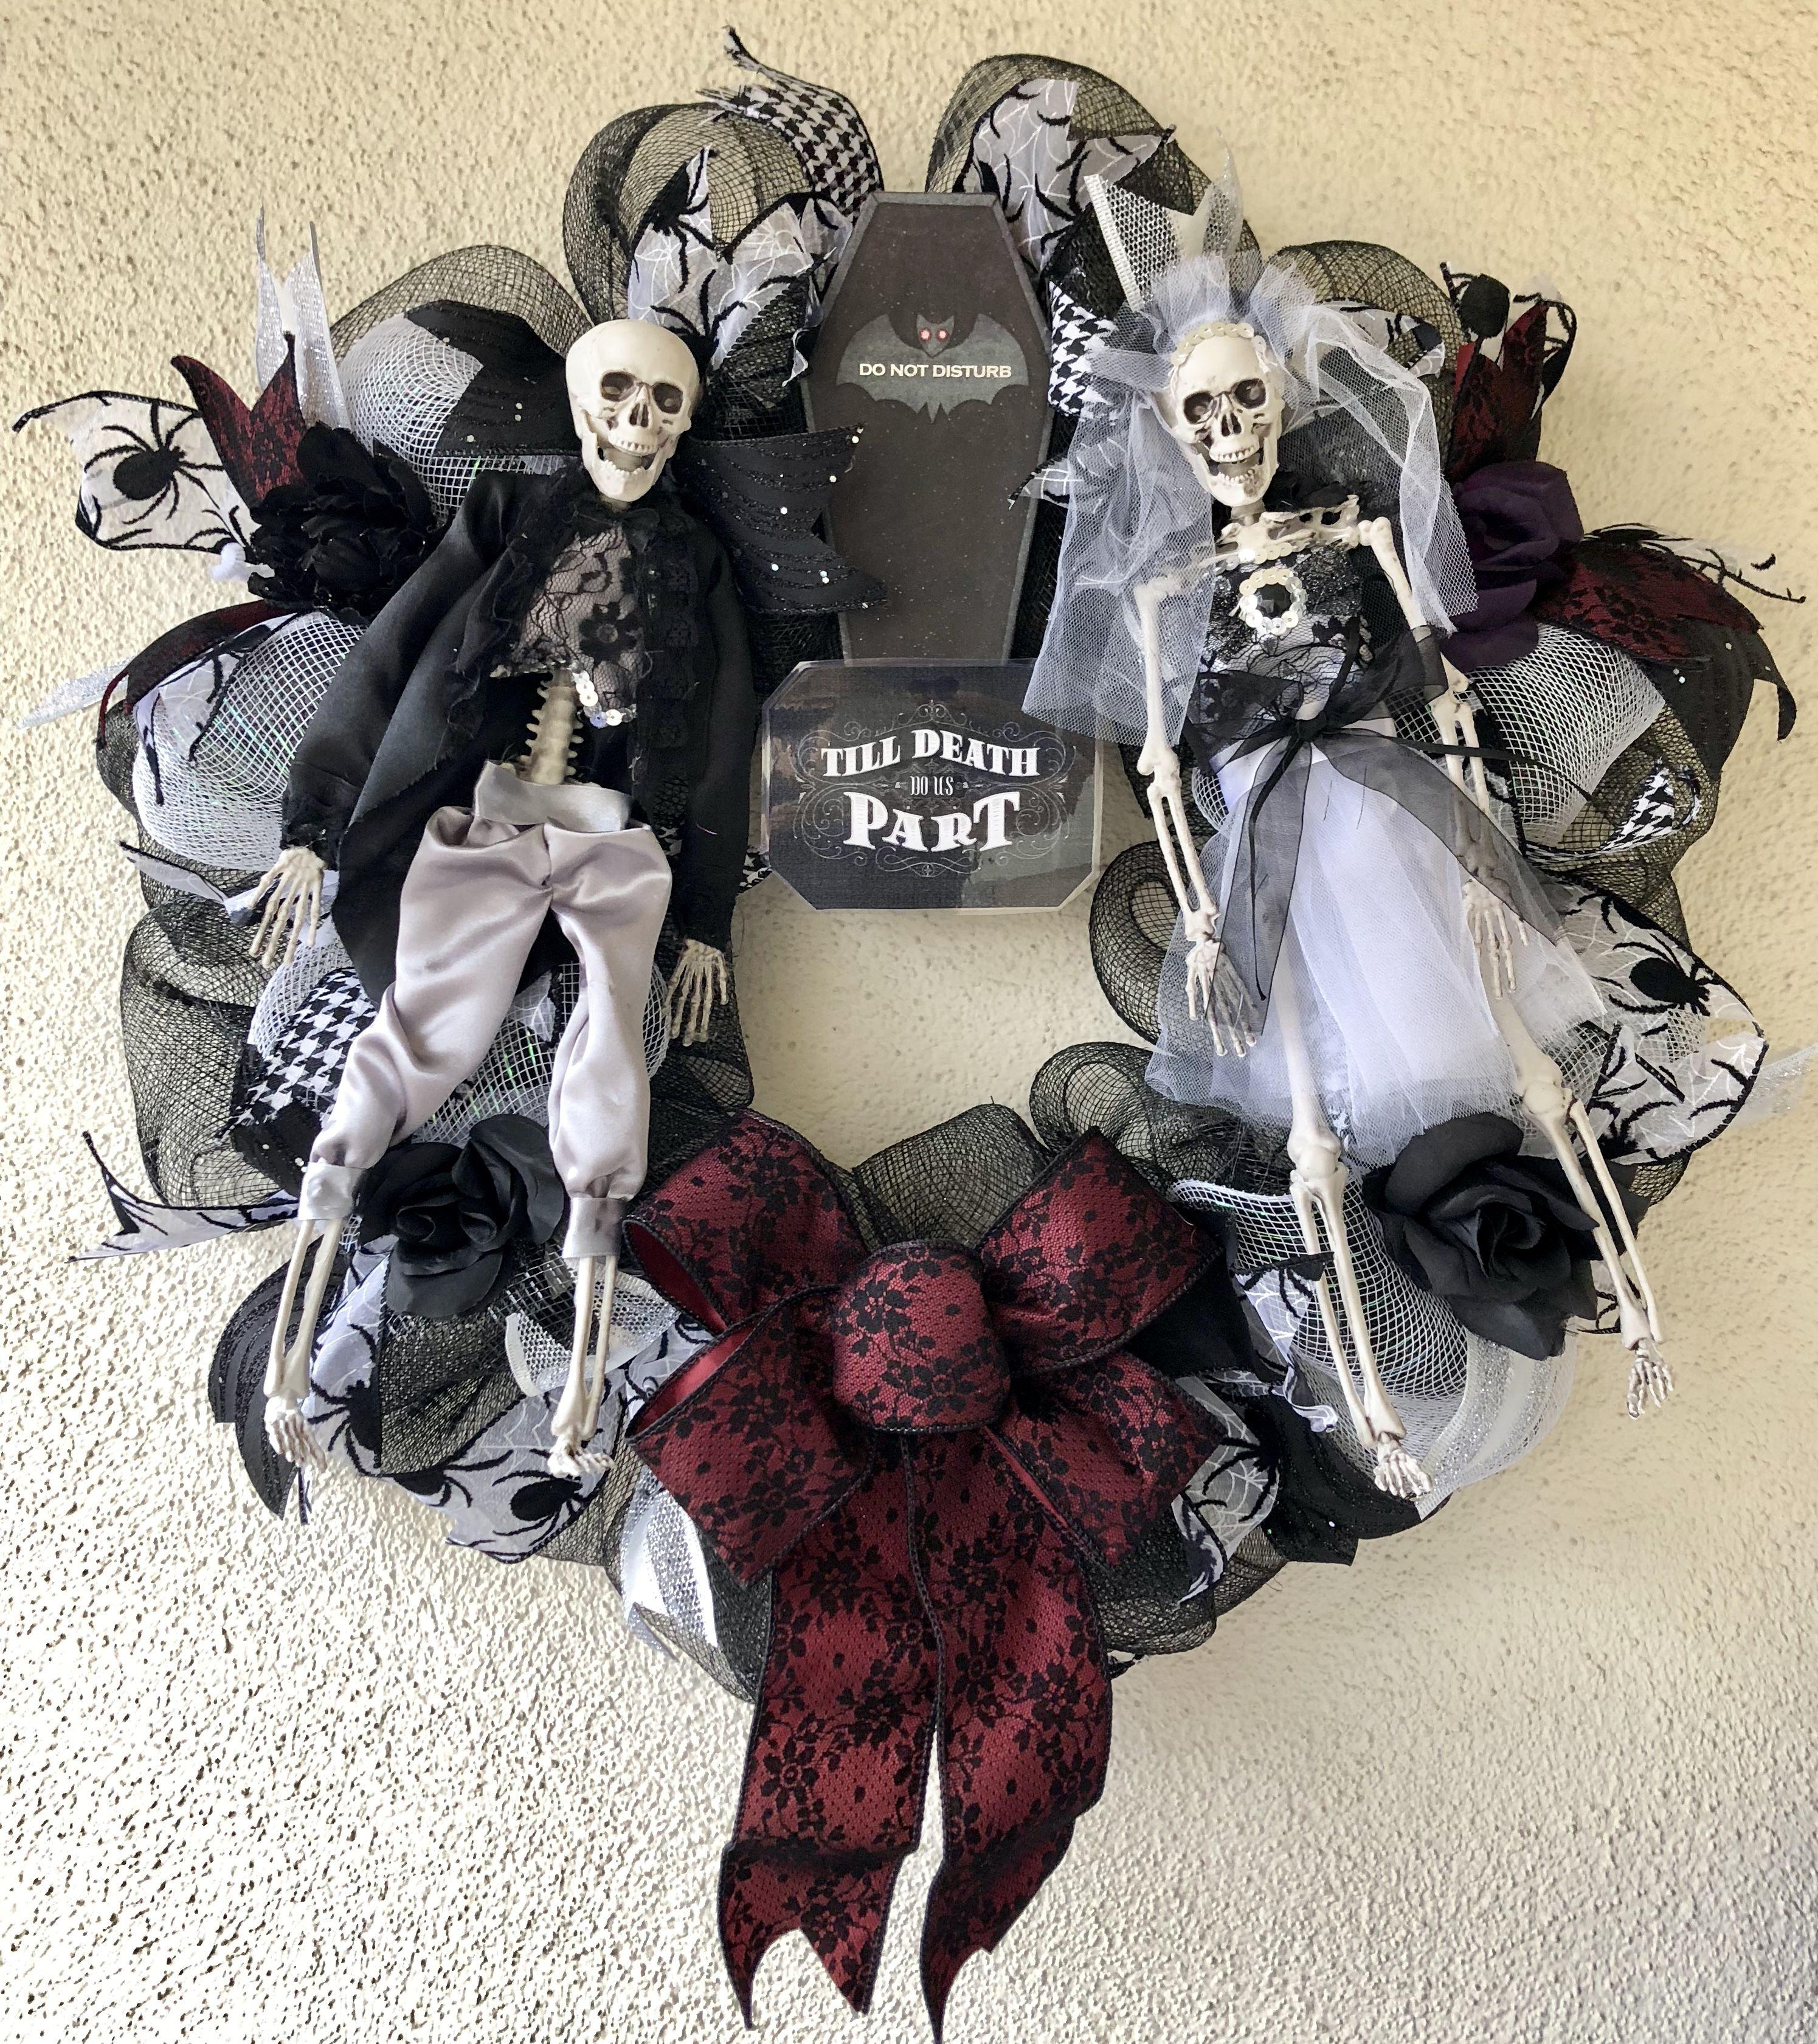 Till Death Do Us Part Wreath Shipped To Philadelphia Pennsylvania